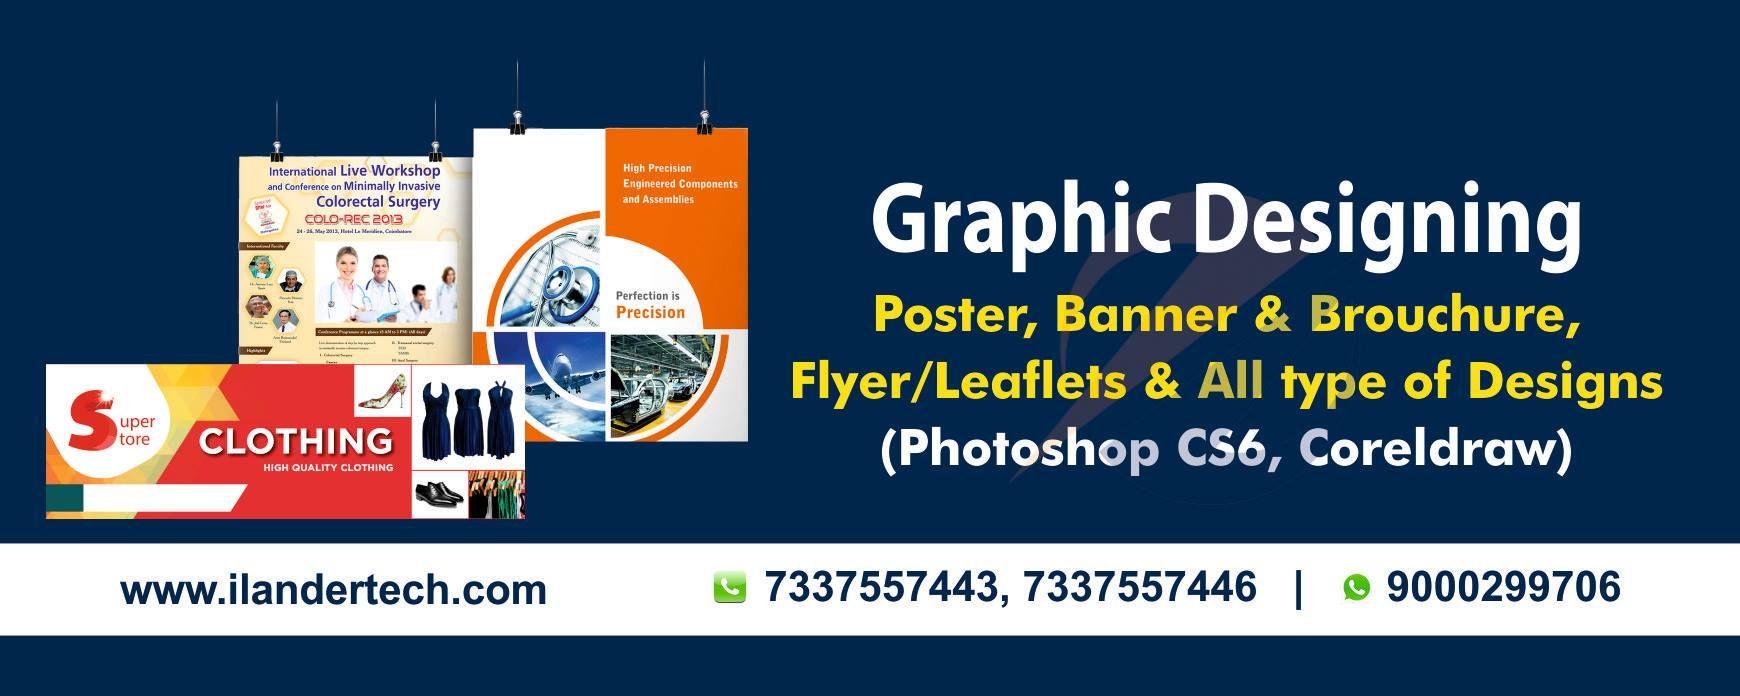 Ilander Technologies Provides Best Graphic Designing Training Company In Hyderabad We Offer W Fun Website Design Seo Digital Marketing Web Development Design